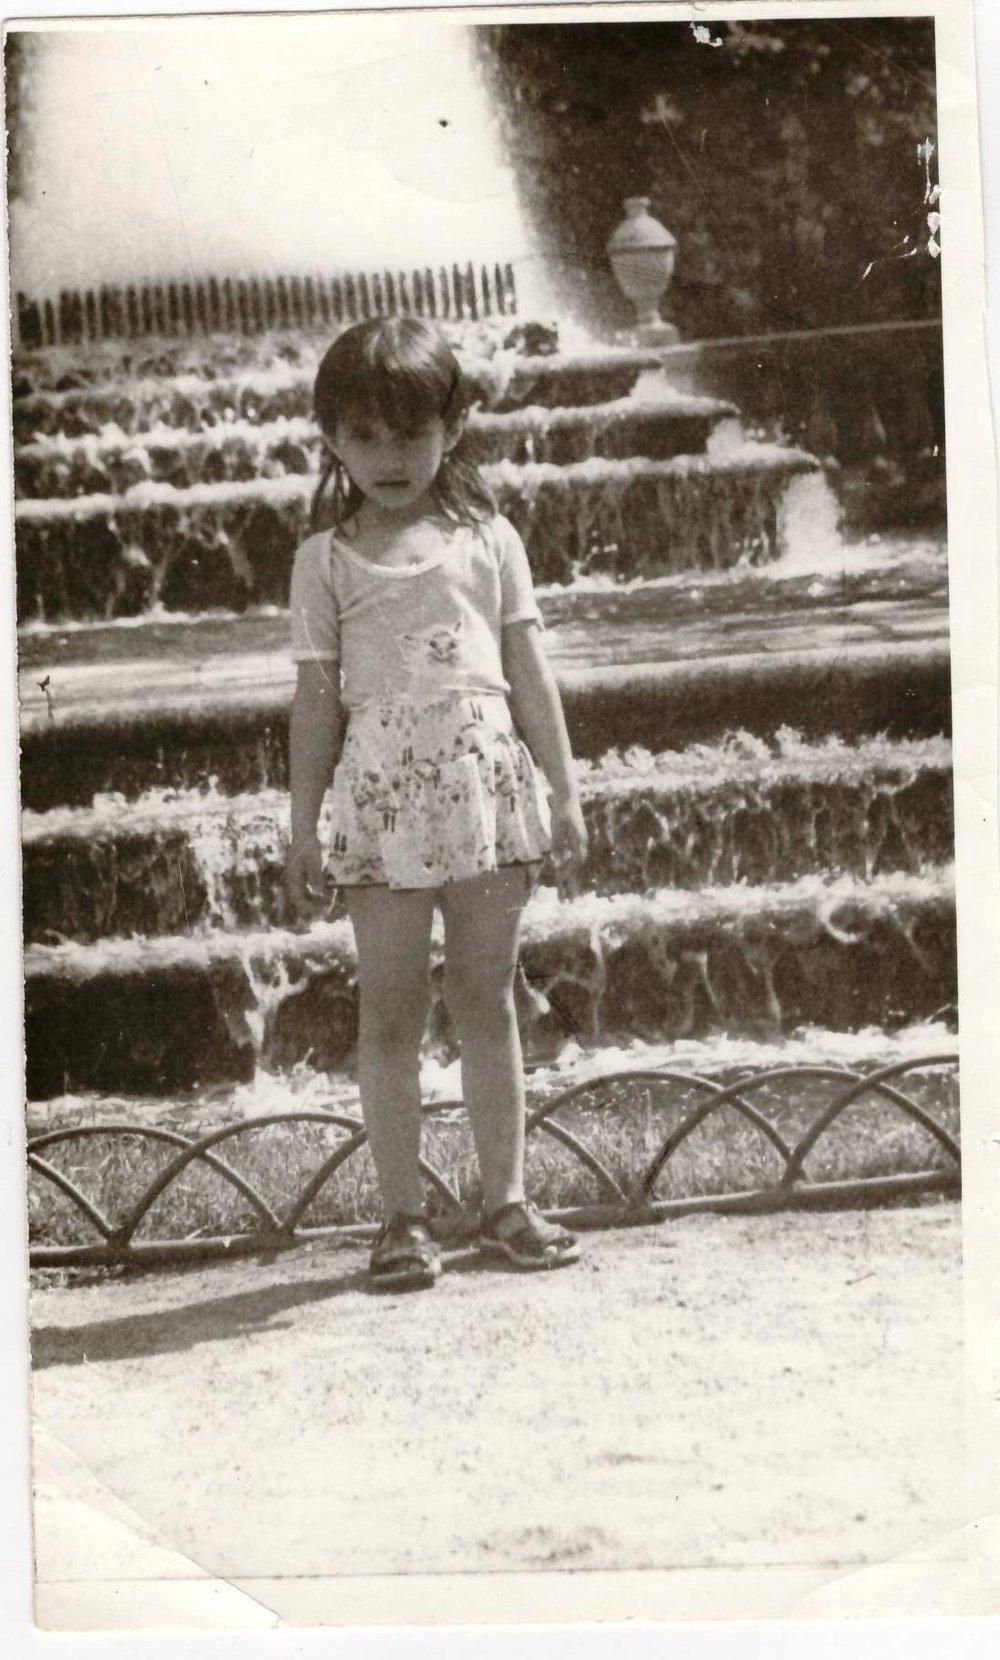 Baku vacation - Age 3